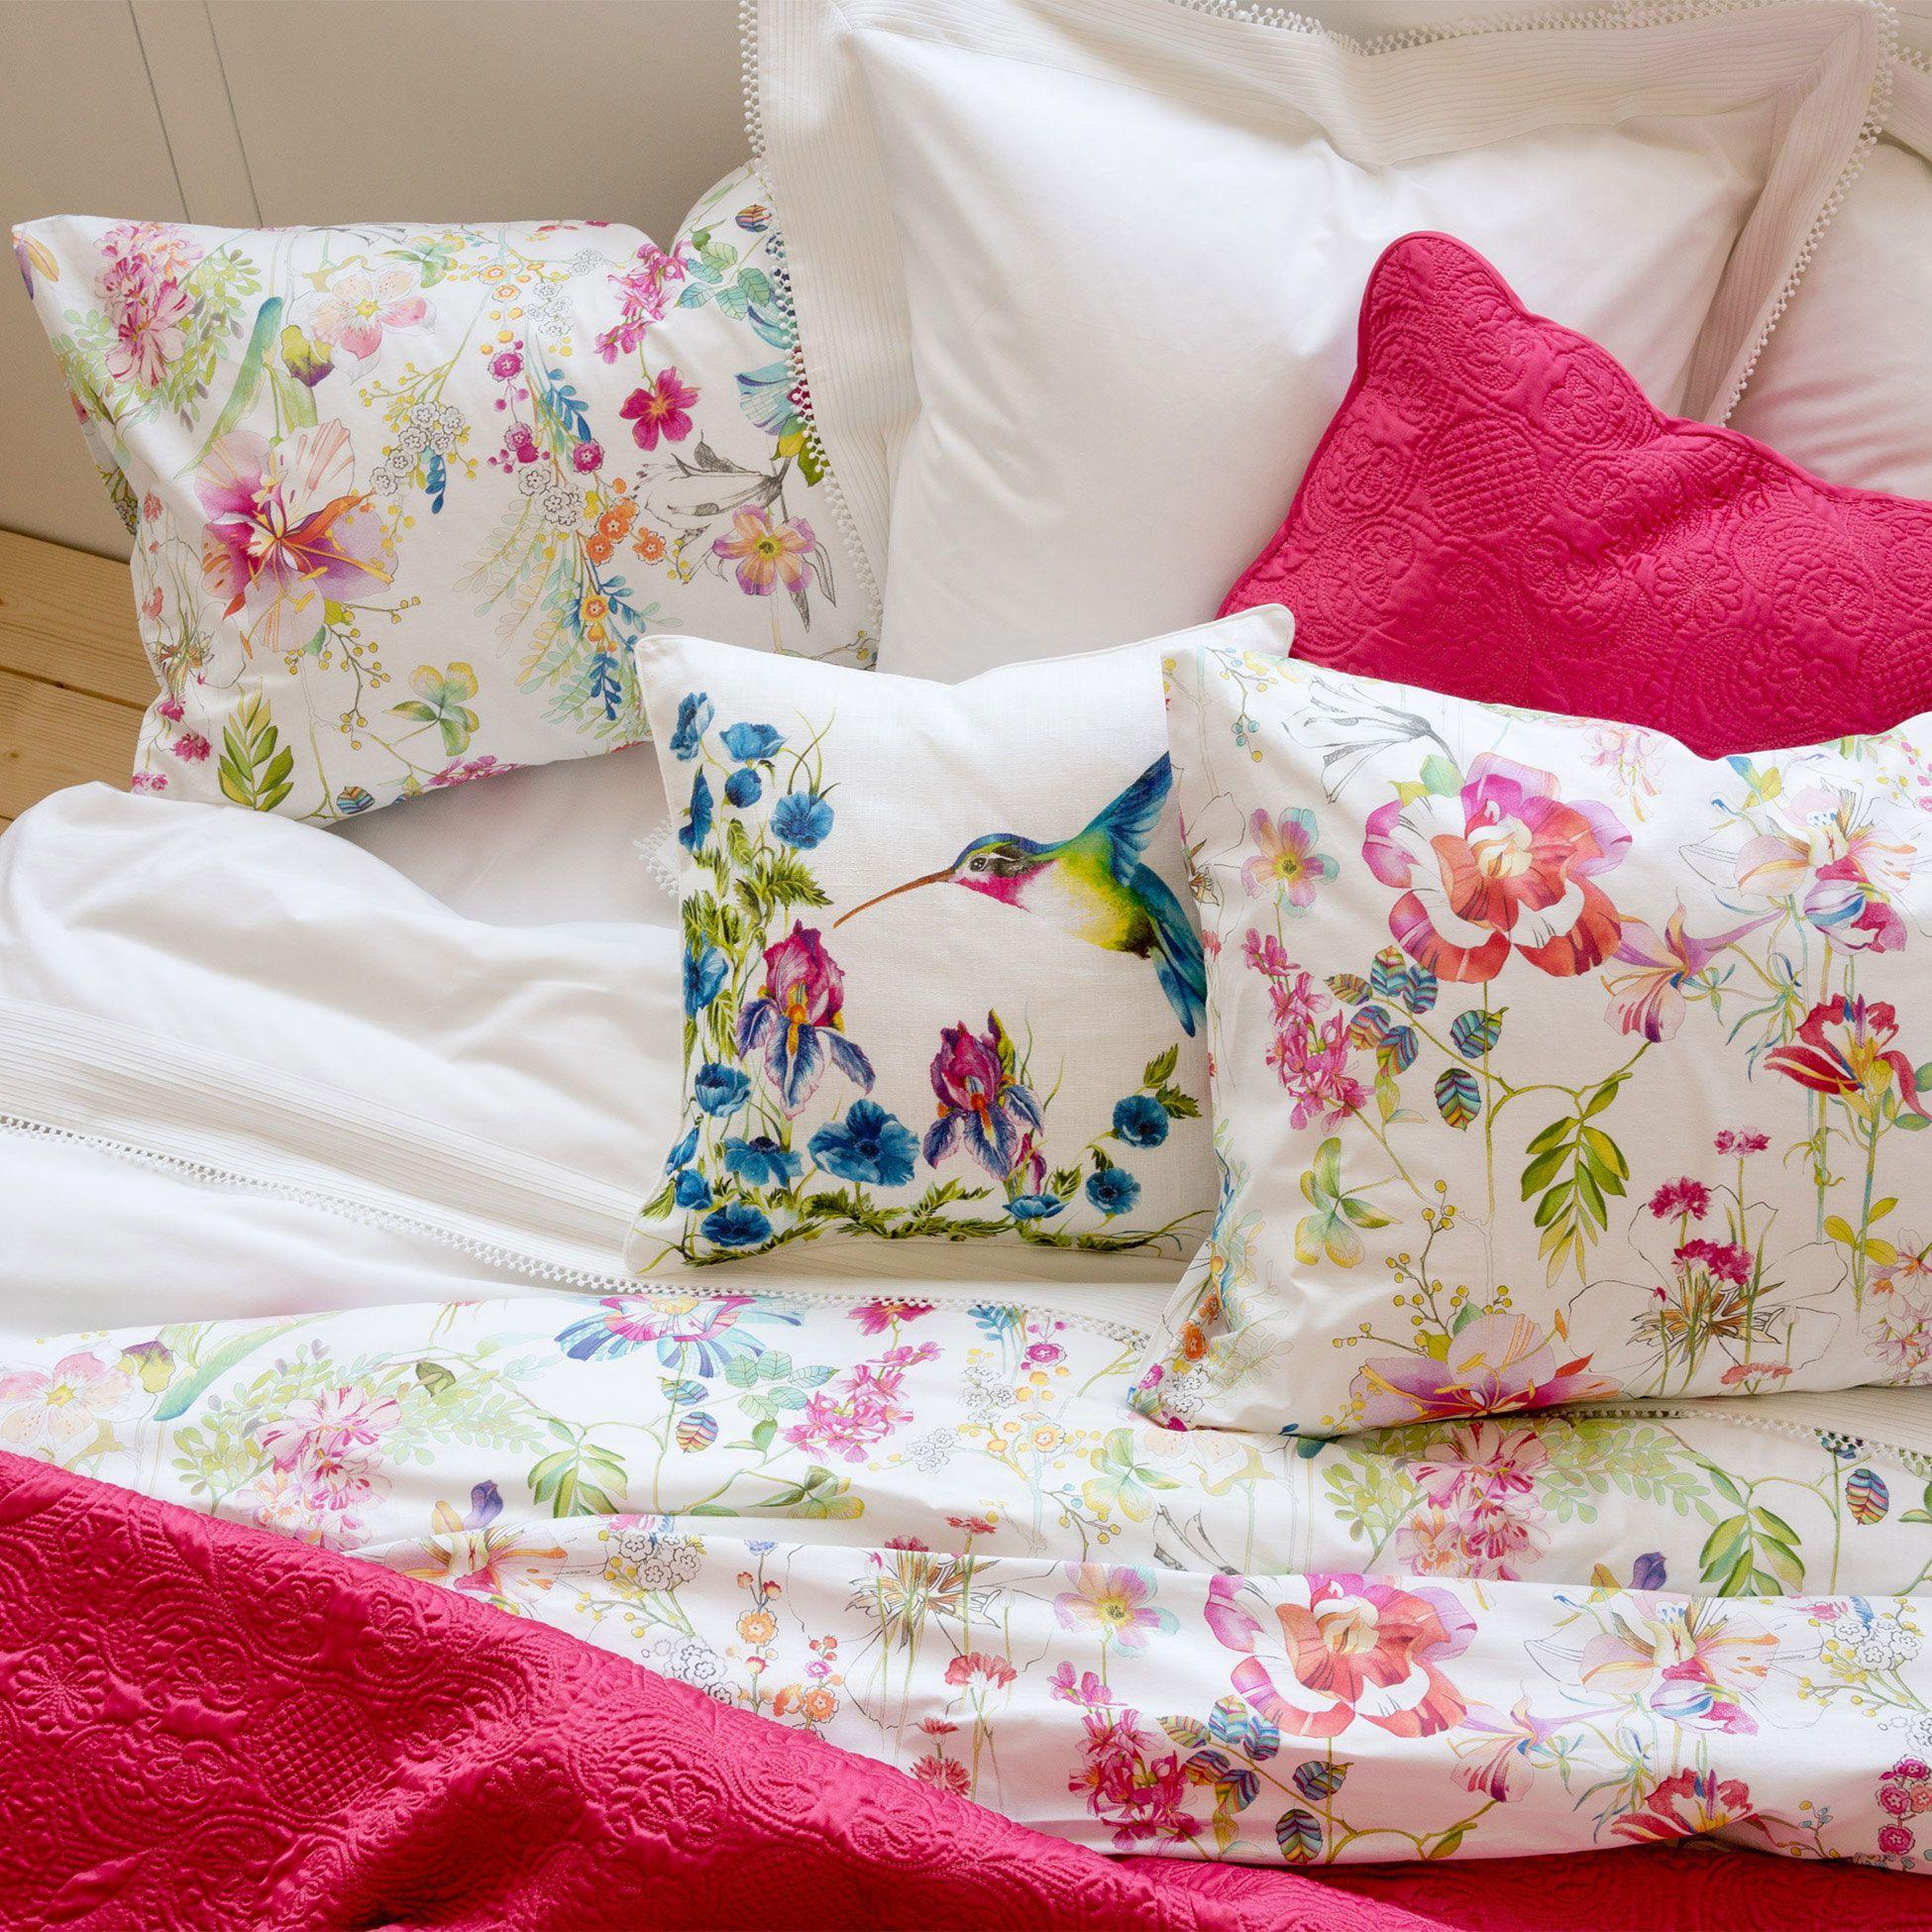 New collection | Zara Home United Kingdom | Zara home ...